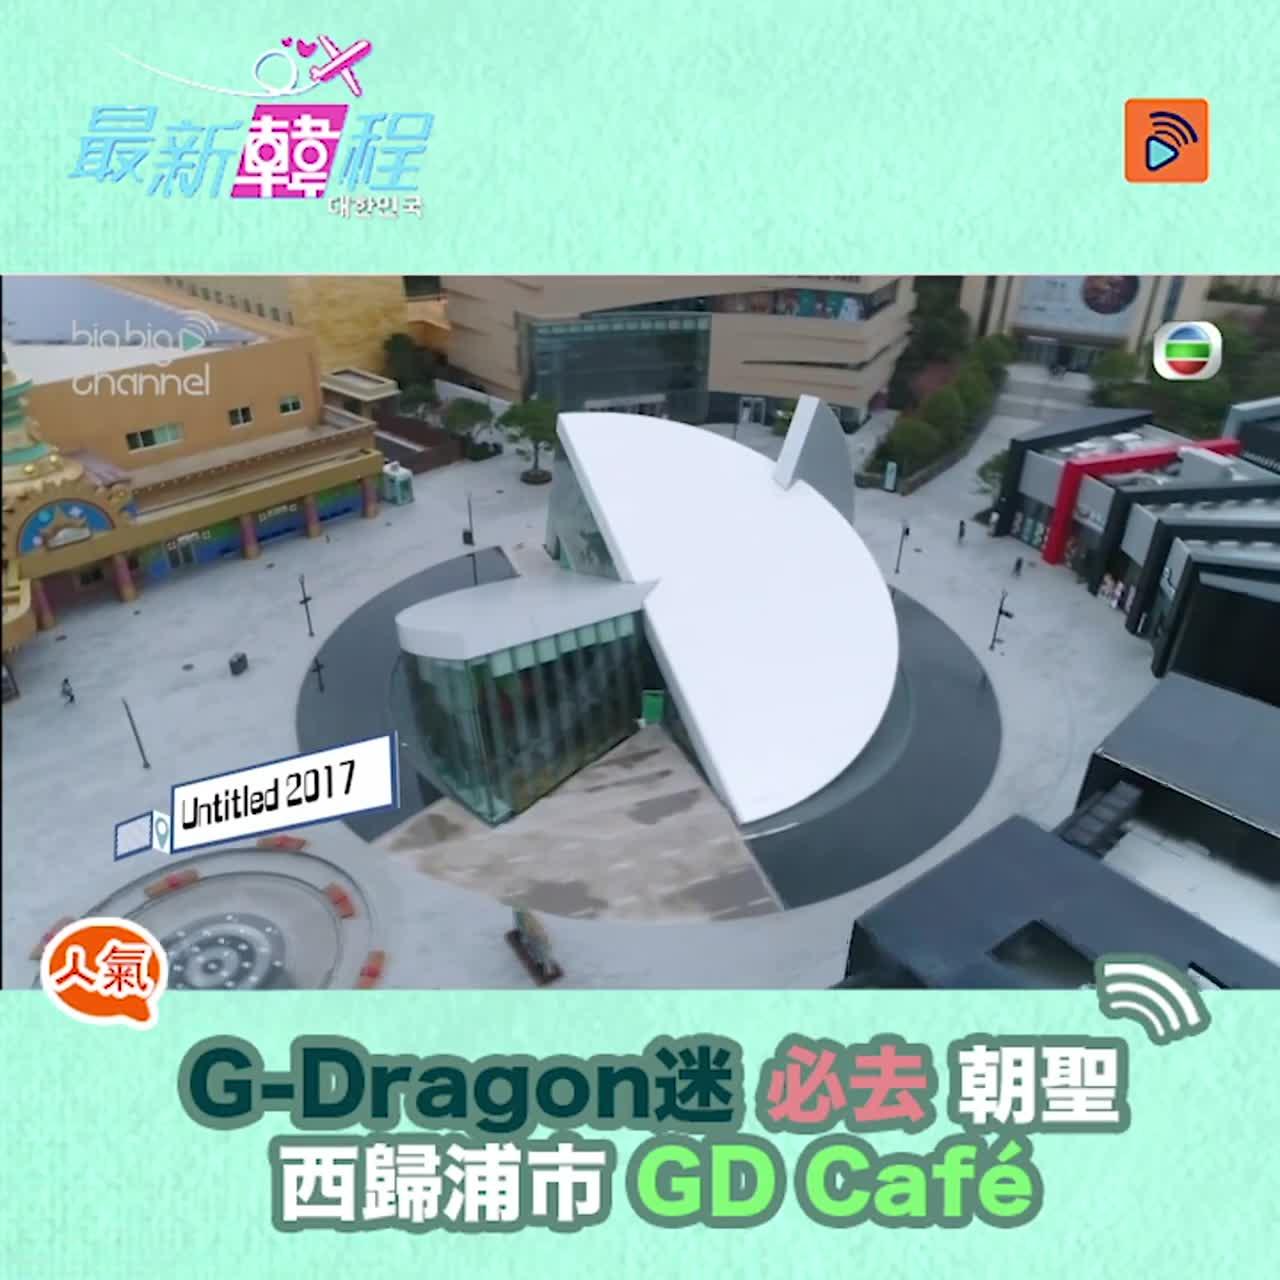 G-Dragon迷必去朝聖 韓國超人氣 GD Café